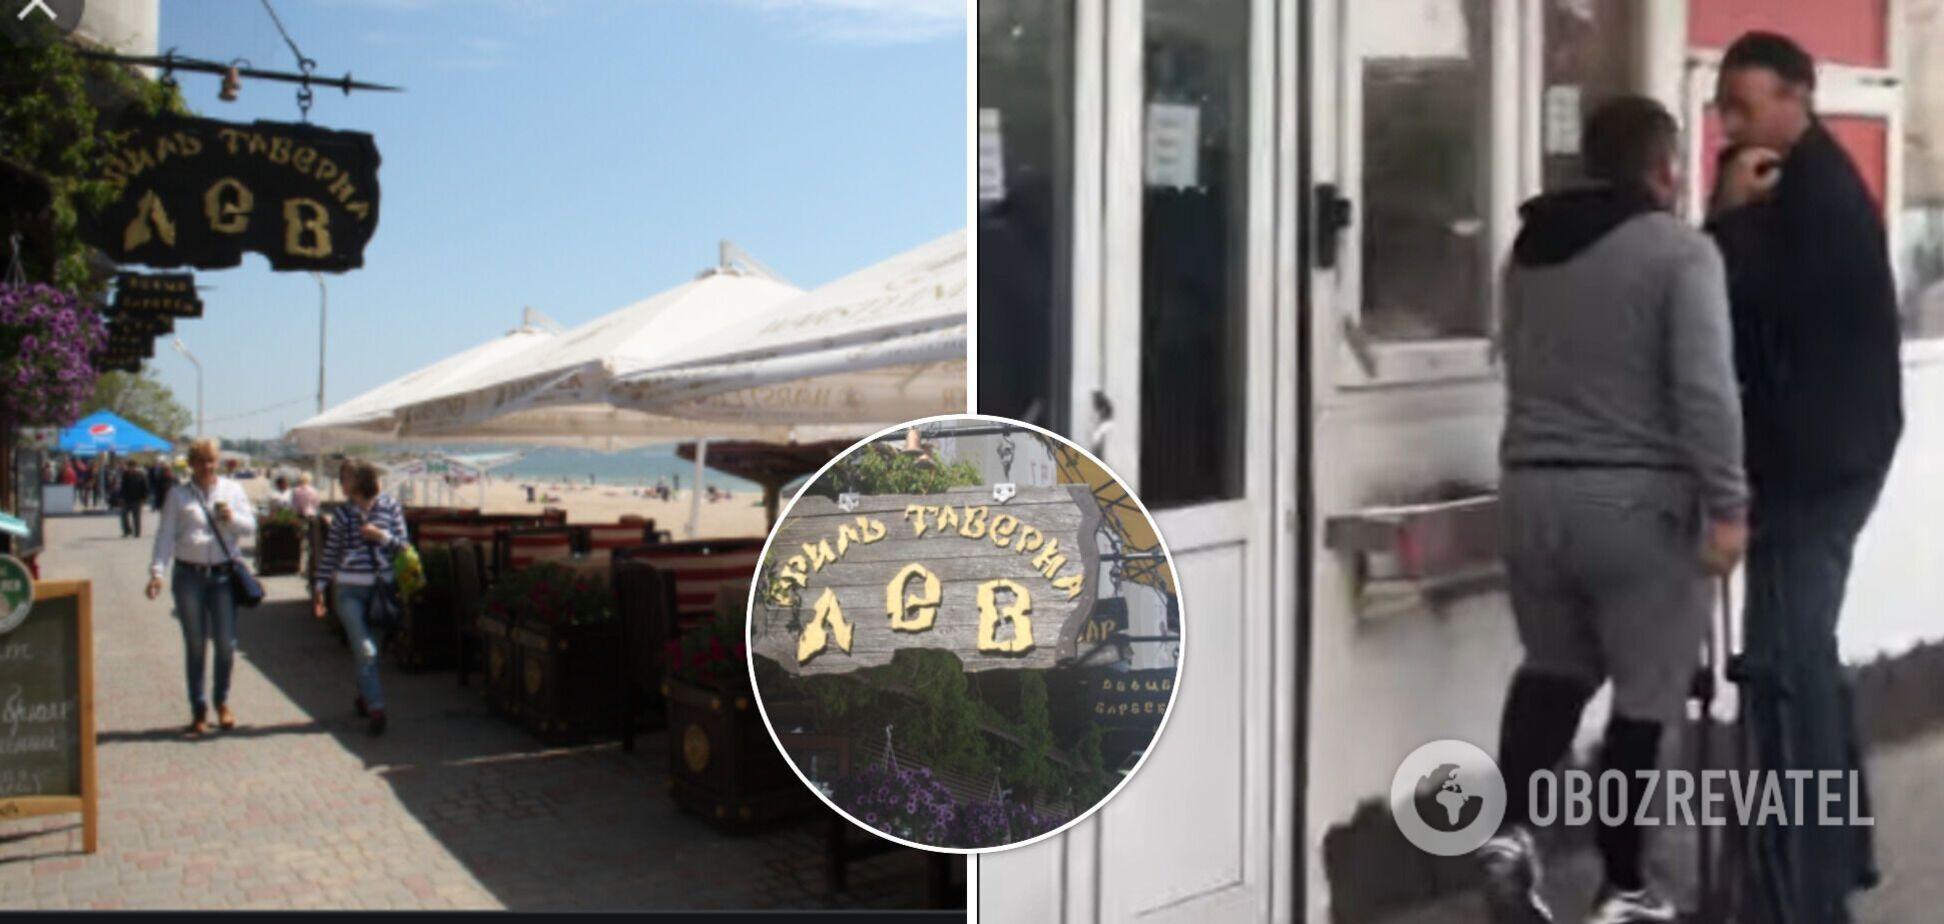 В Одессе владелец незаконно работающего кафе напал на журналистов во время съемки. Фото и видео